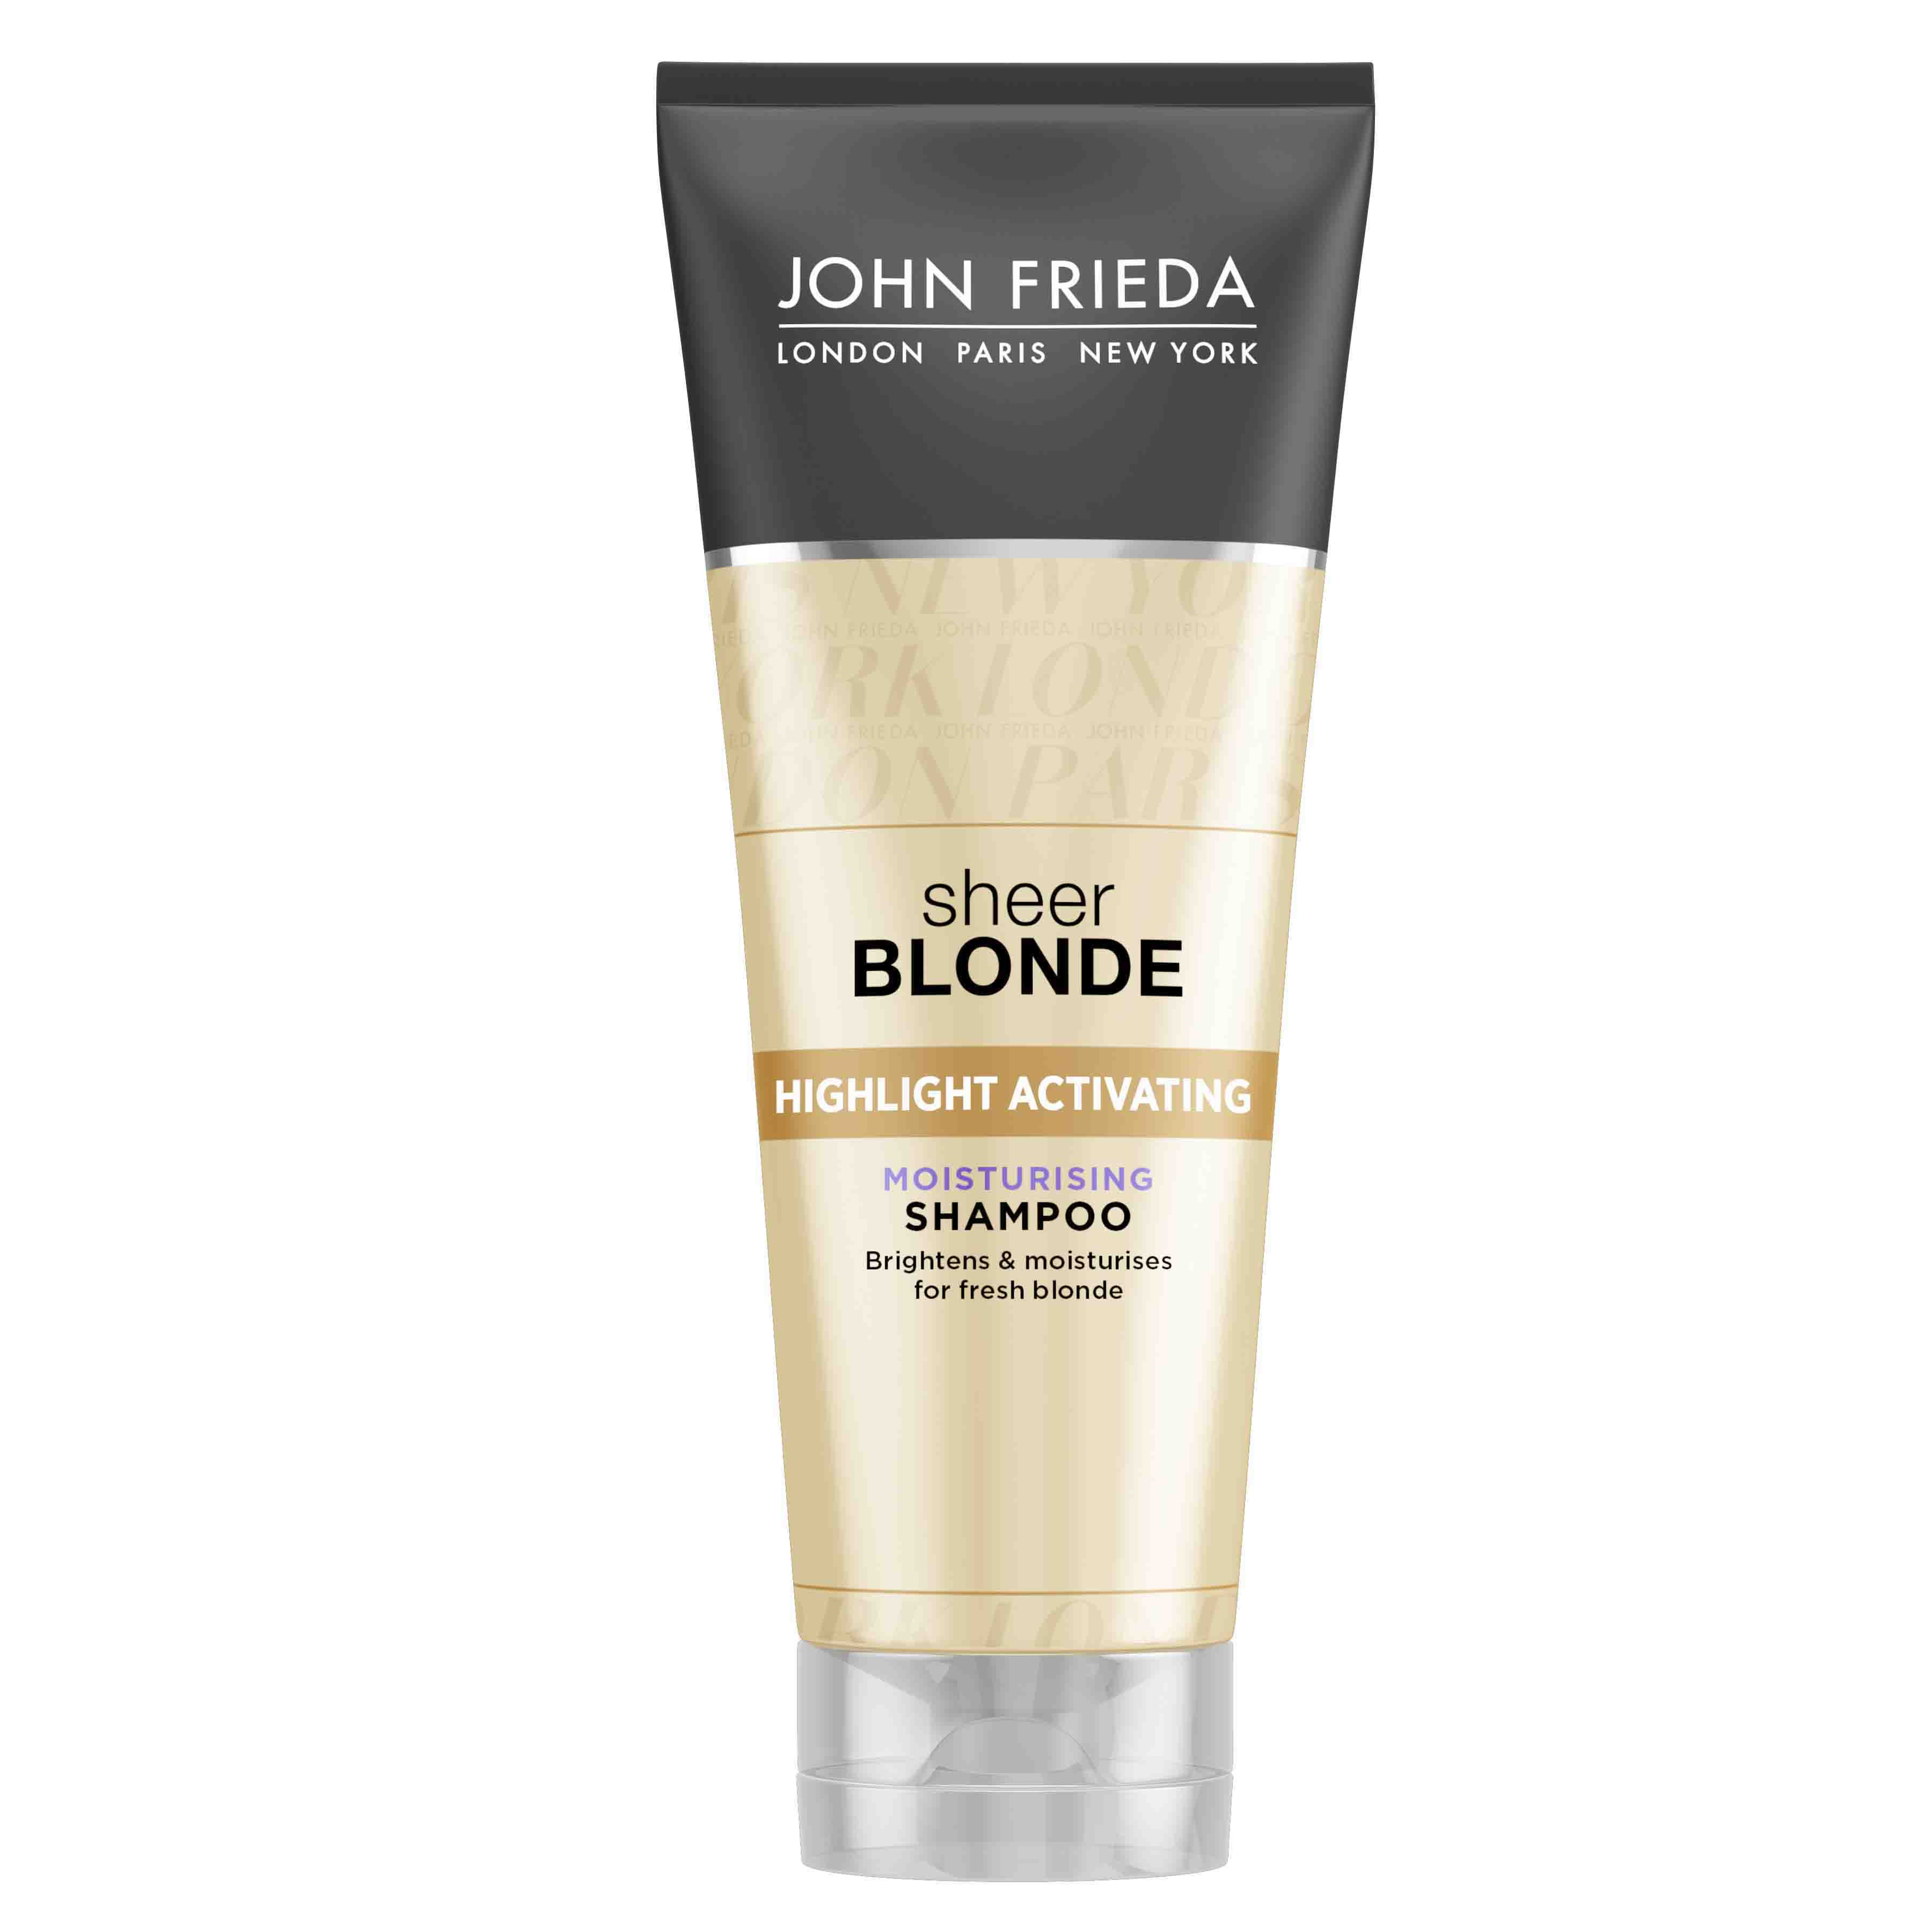 ДЖОН ФРИДА ШИР БЛОНД Хидратиращ шампоан за руса коса 250мл | JOHN FRIEDA SHEER BLONDE Highlight activating moisturising shampoo 250ml